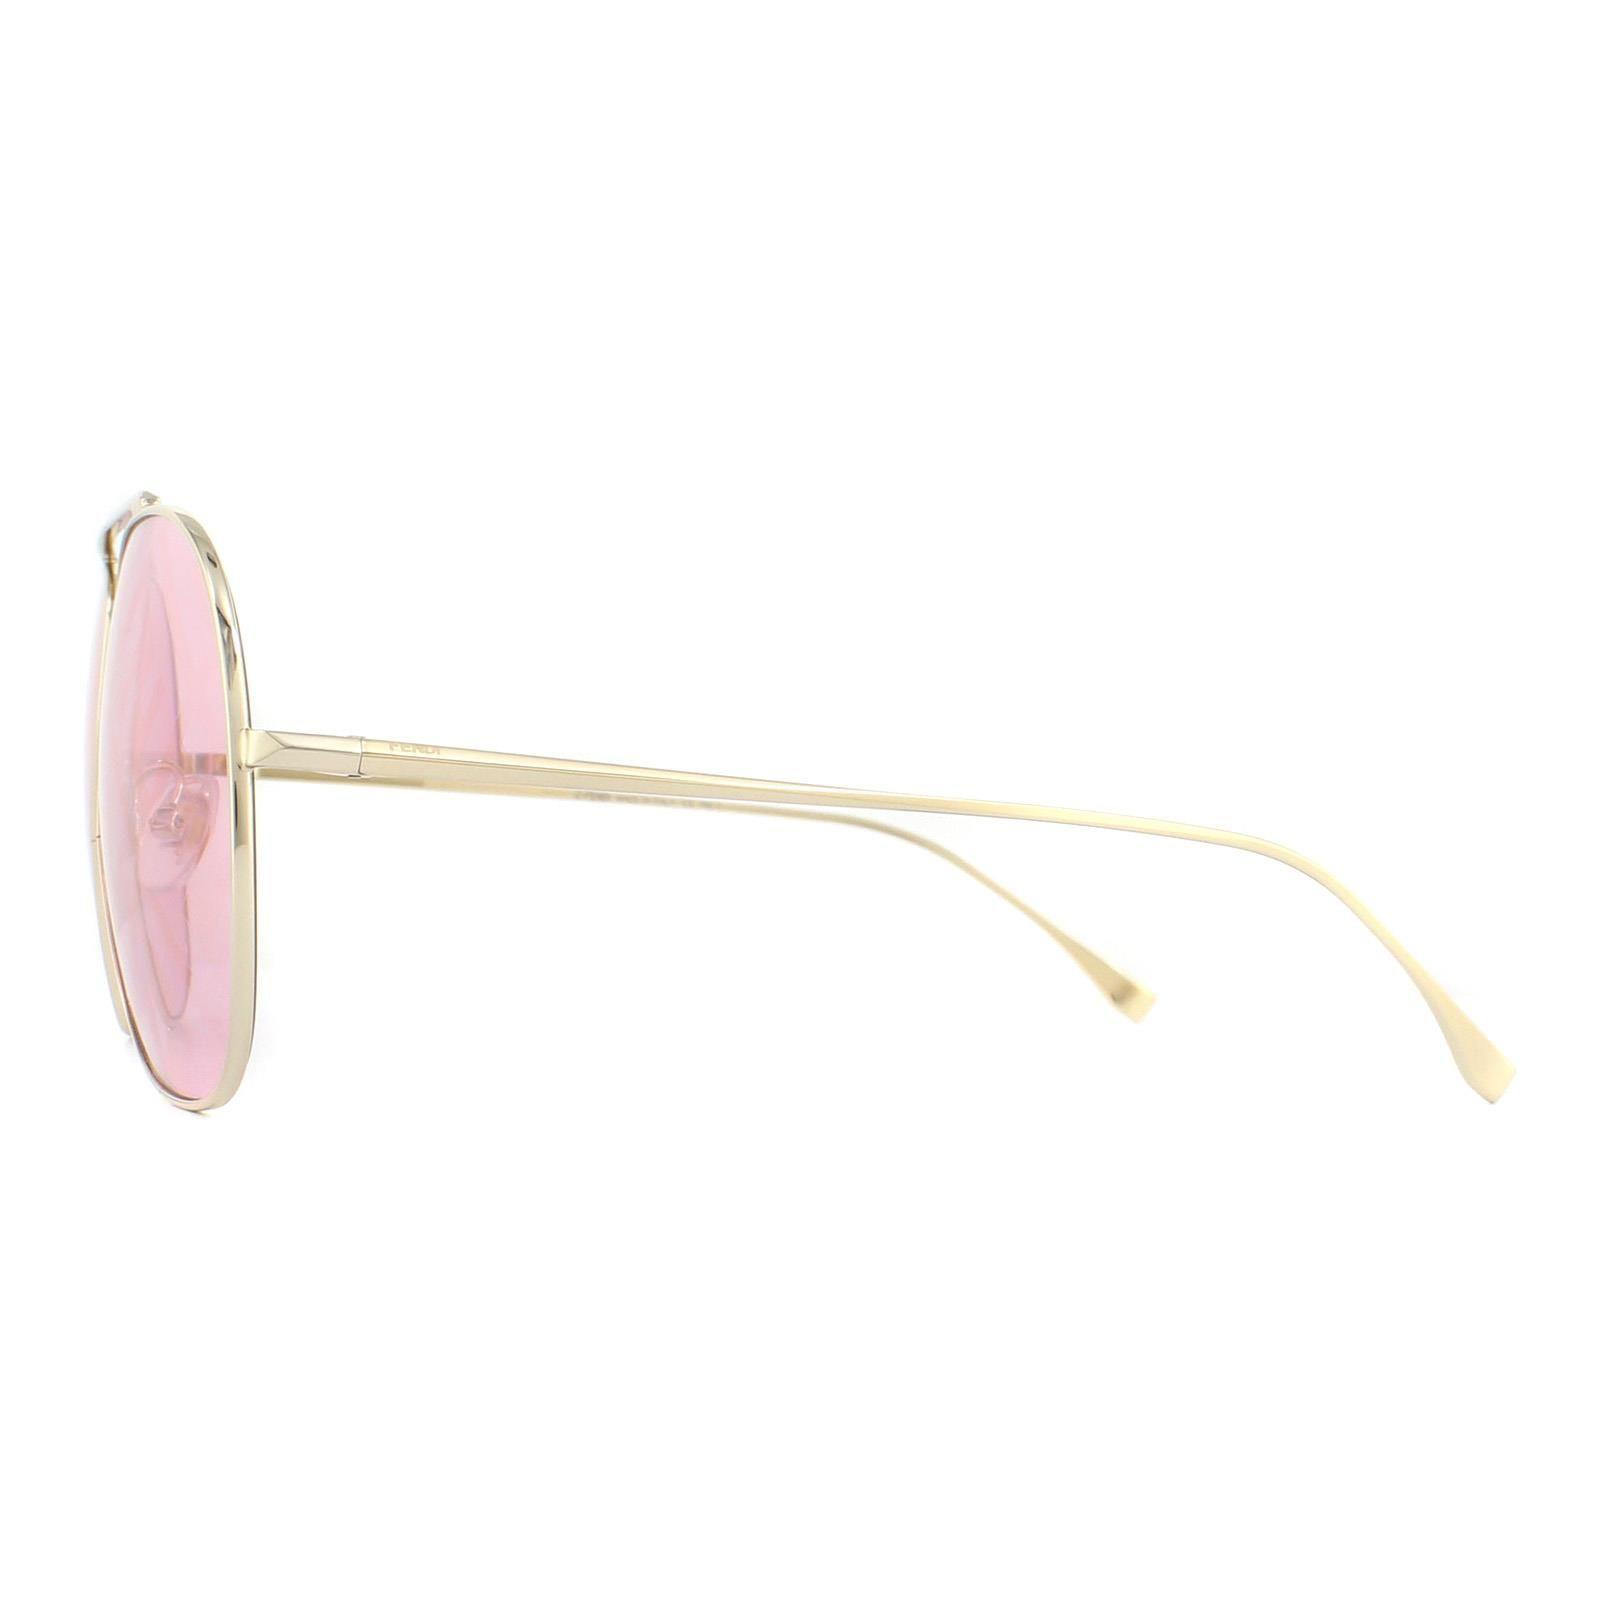 Fendi Sunglasses FF 0407/G/S EYR 0L Gold Pink Pink Fendi Monogram